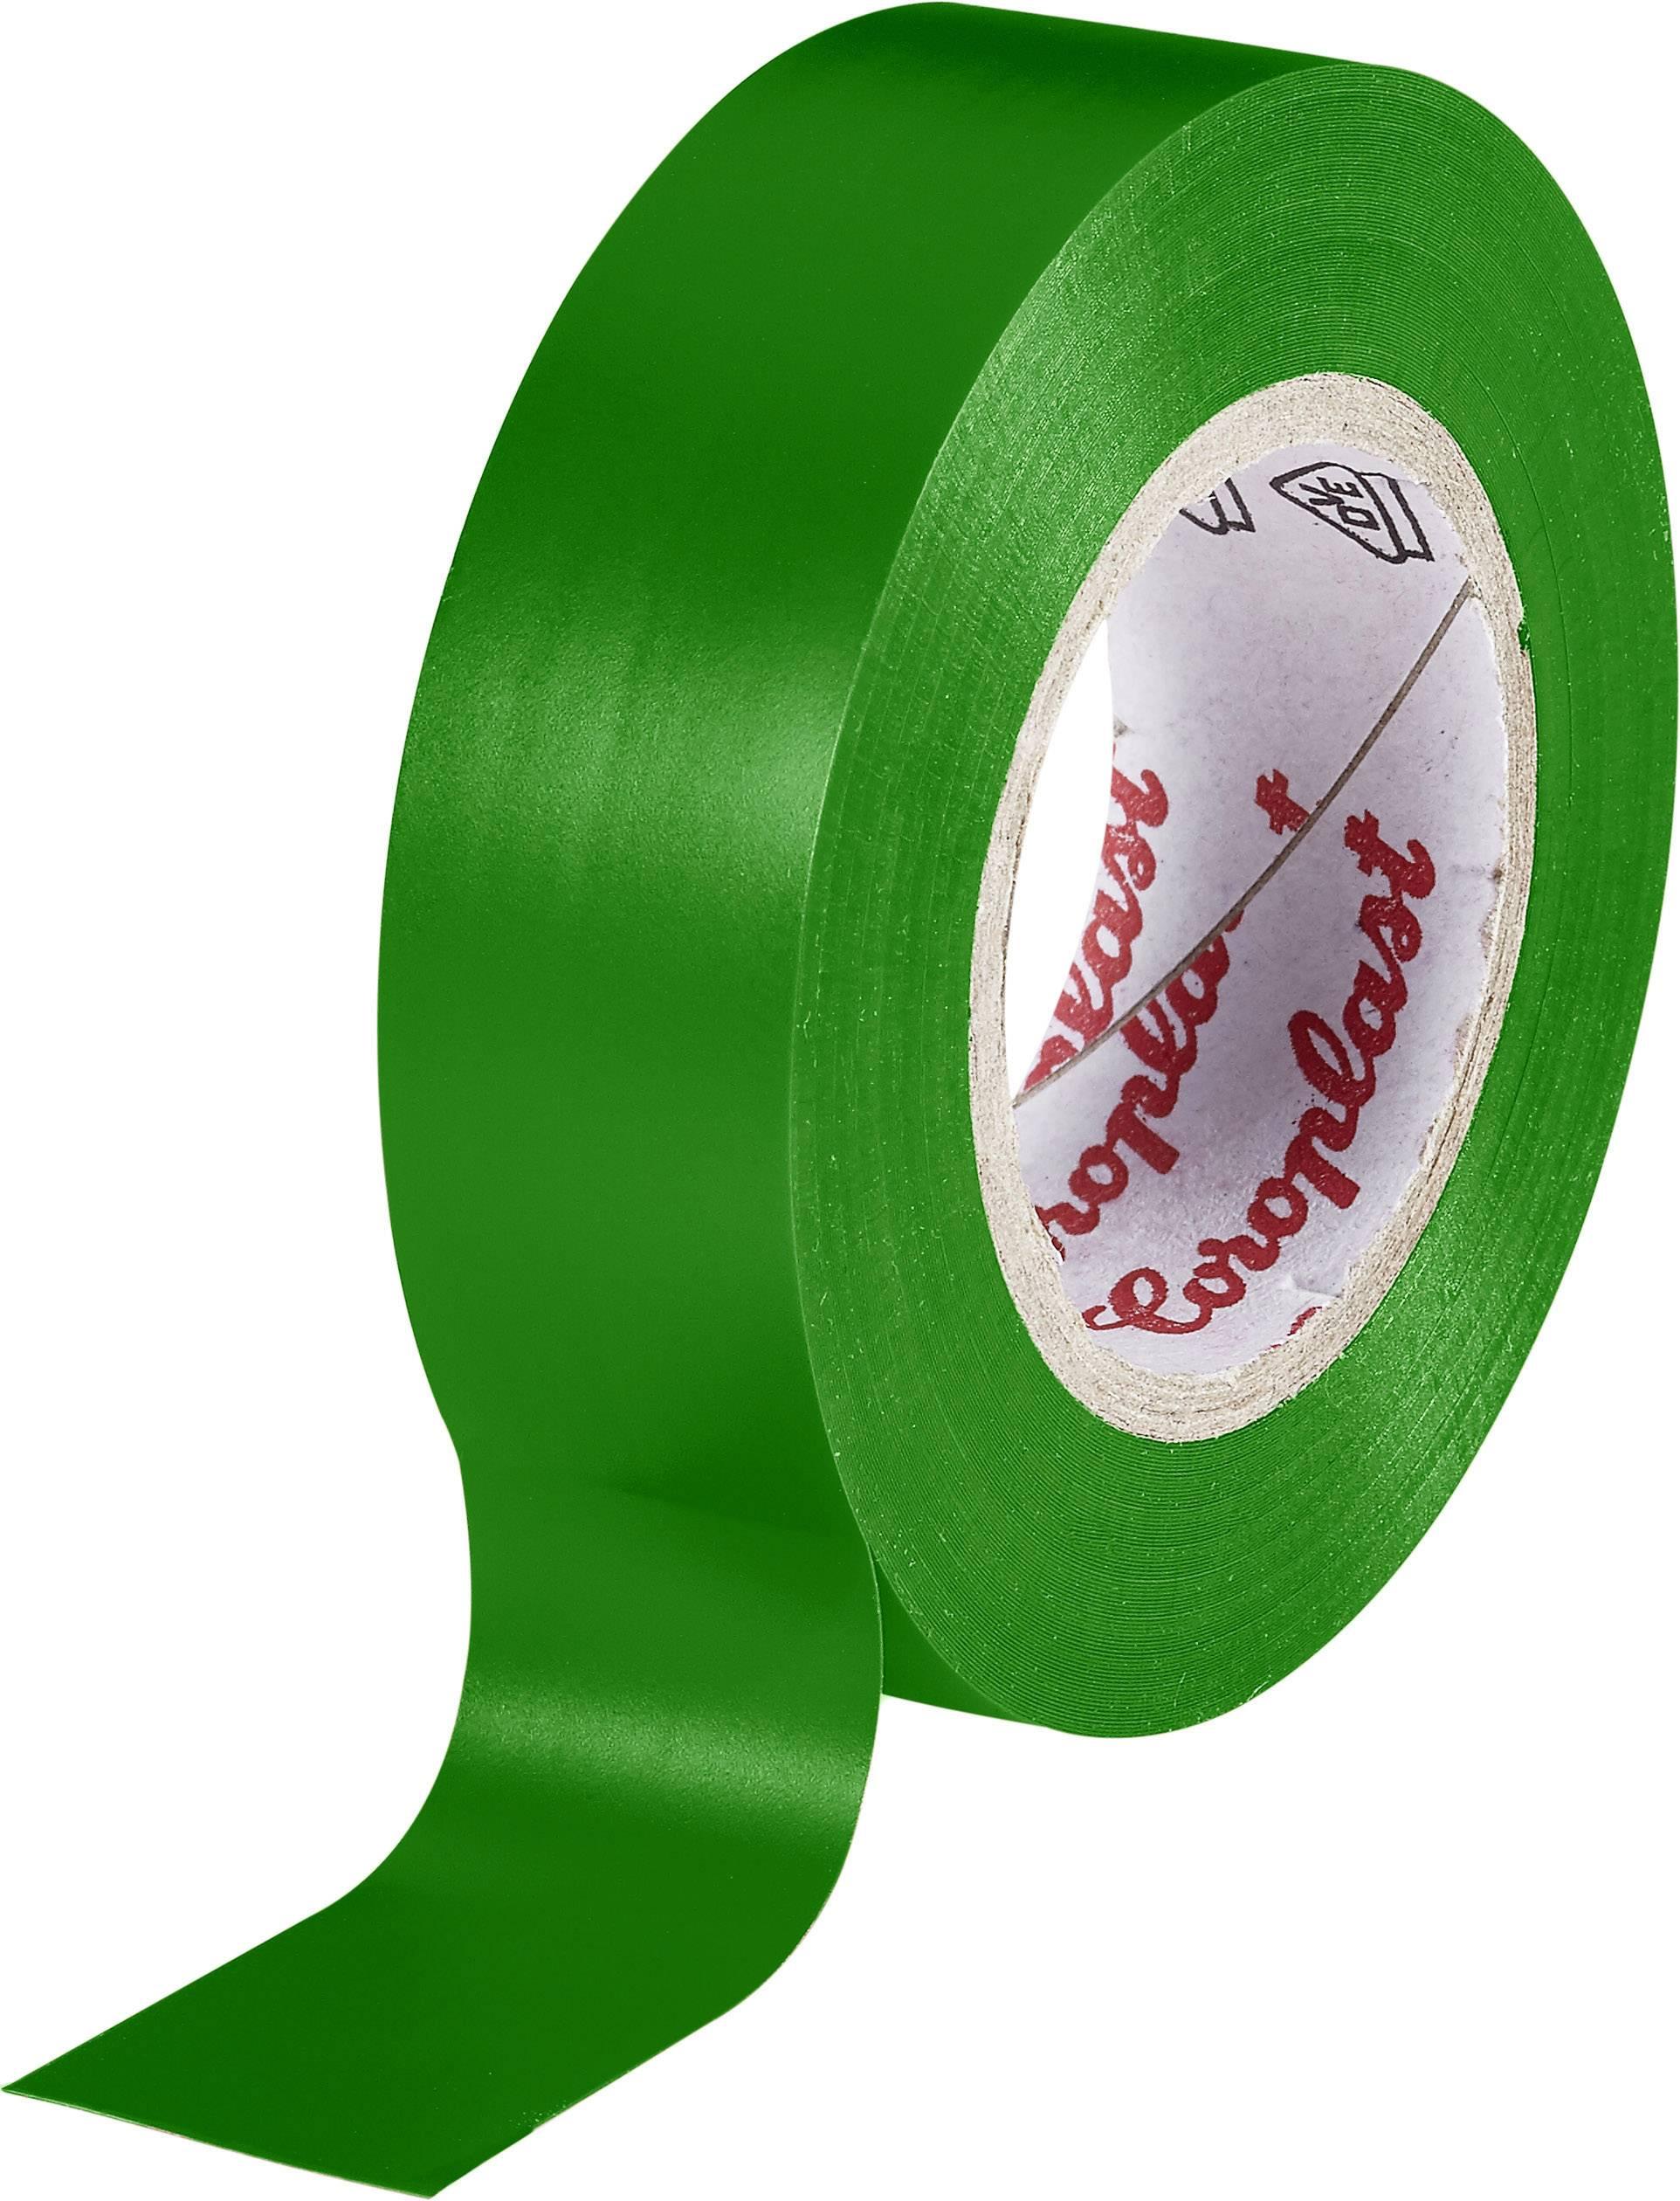 Izolačná páska Coroplast 302 302, (d x š) 10 m x 15 mm, zelená, 1 roliek